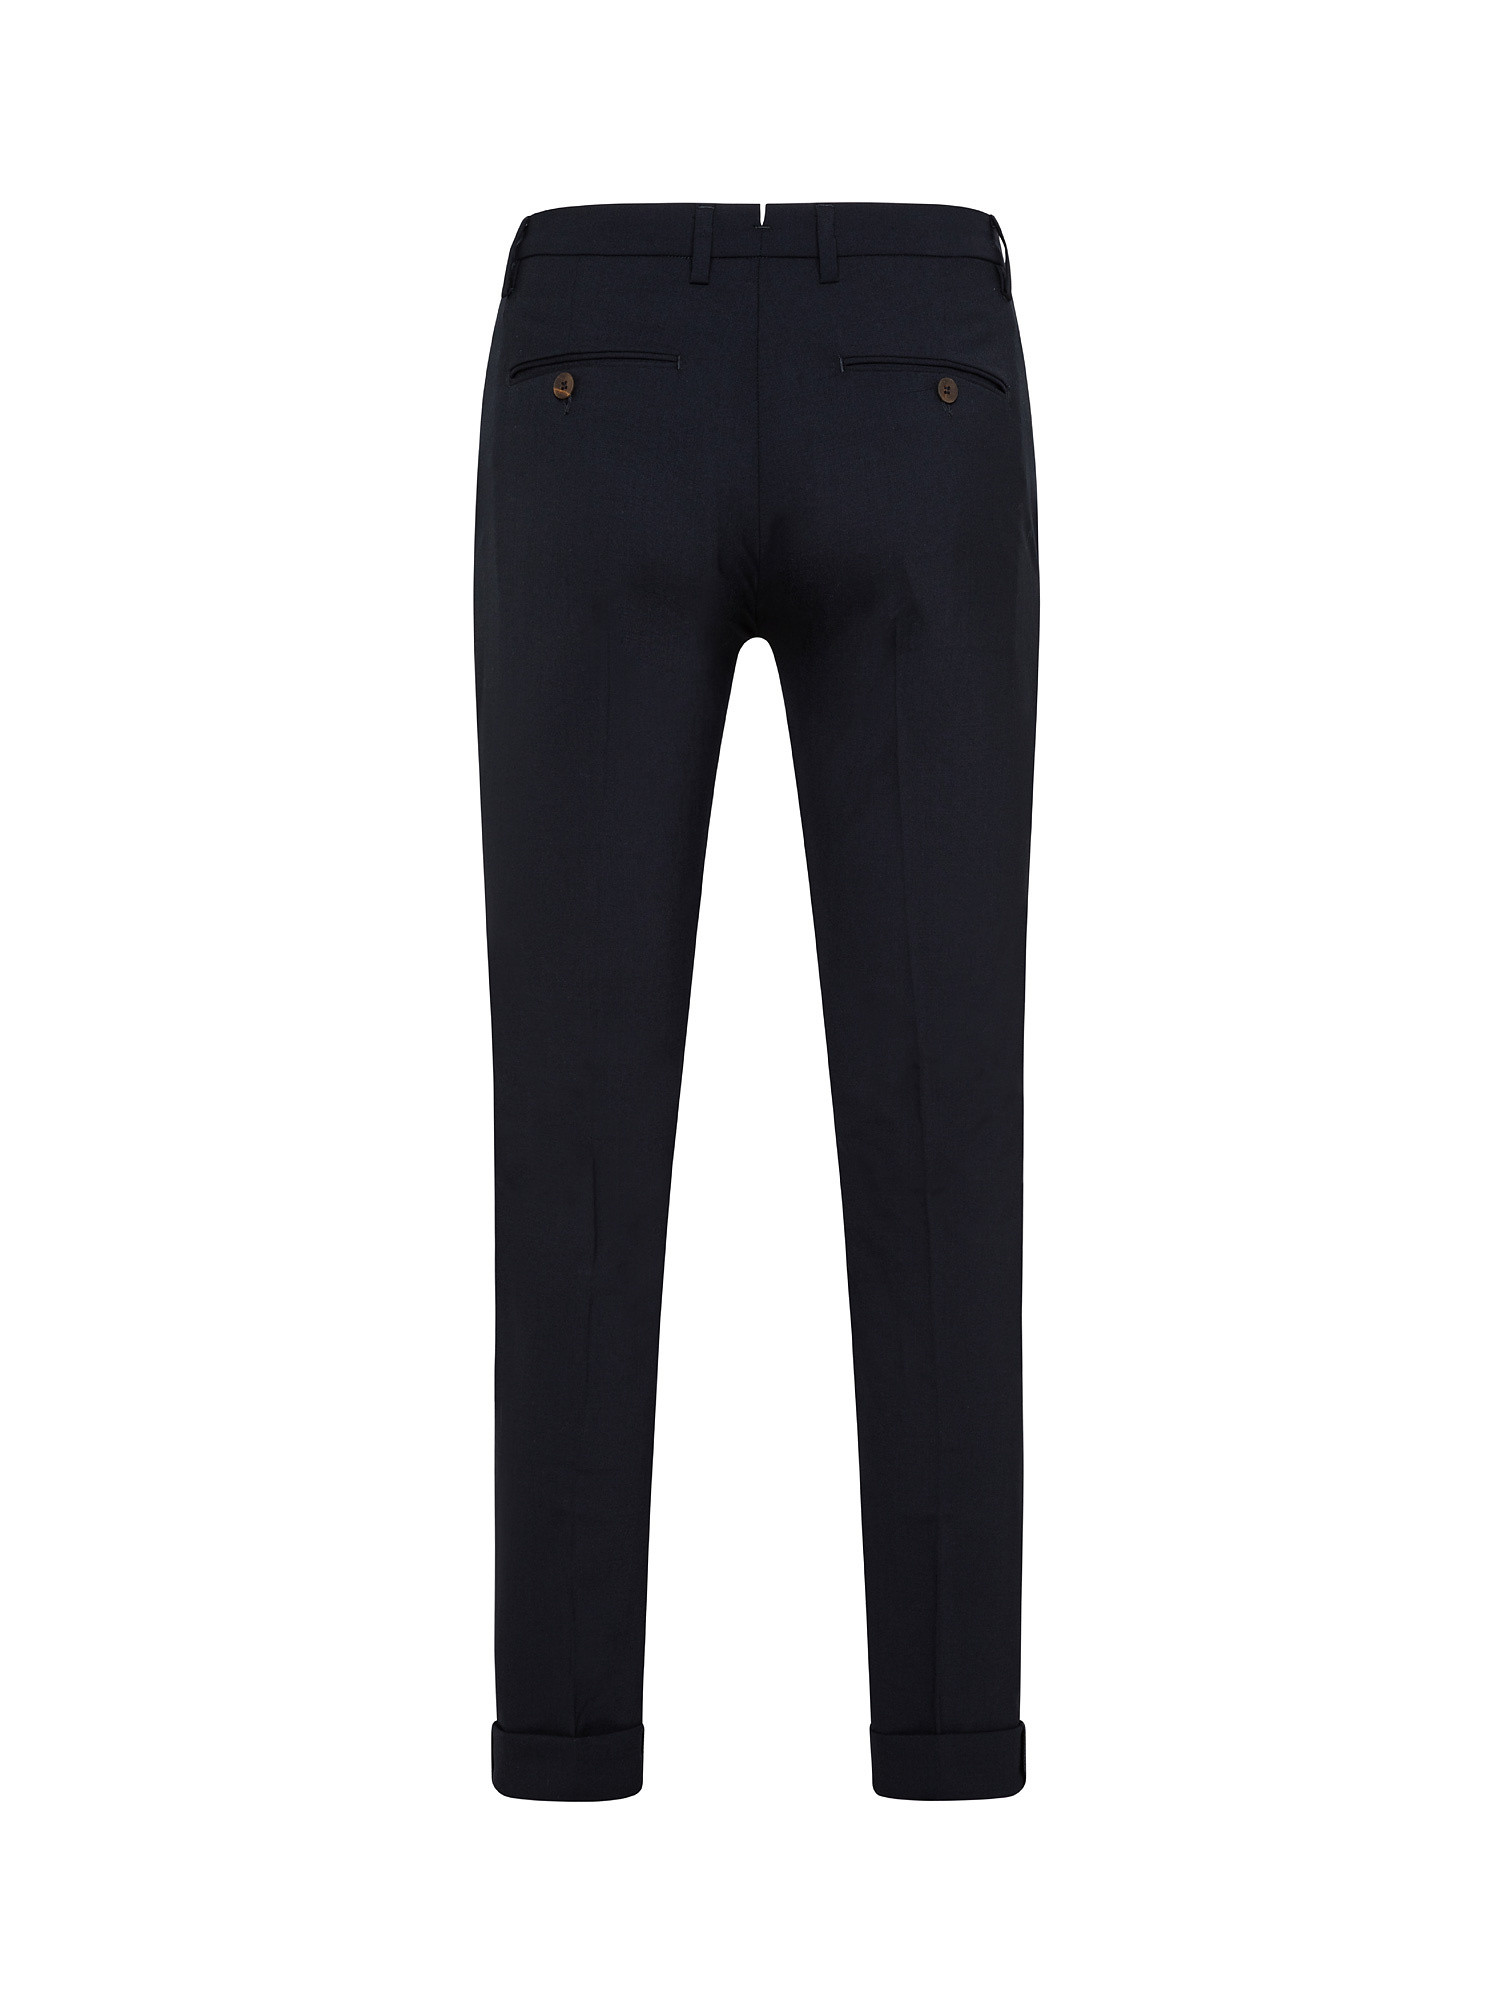 Pantalone chino misto lana, Blu scuro, large image number 1